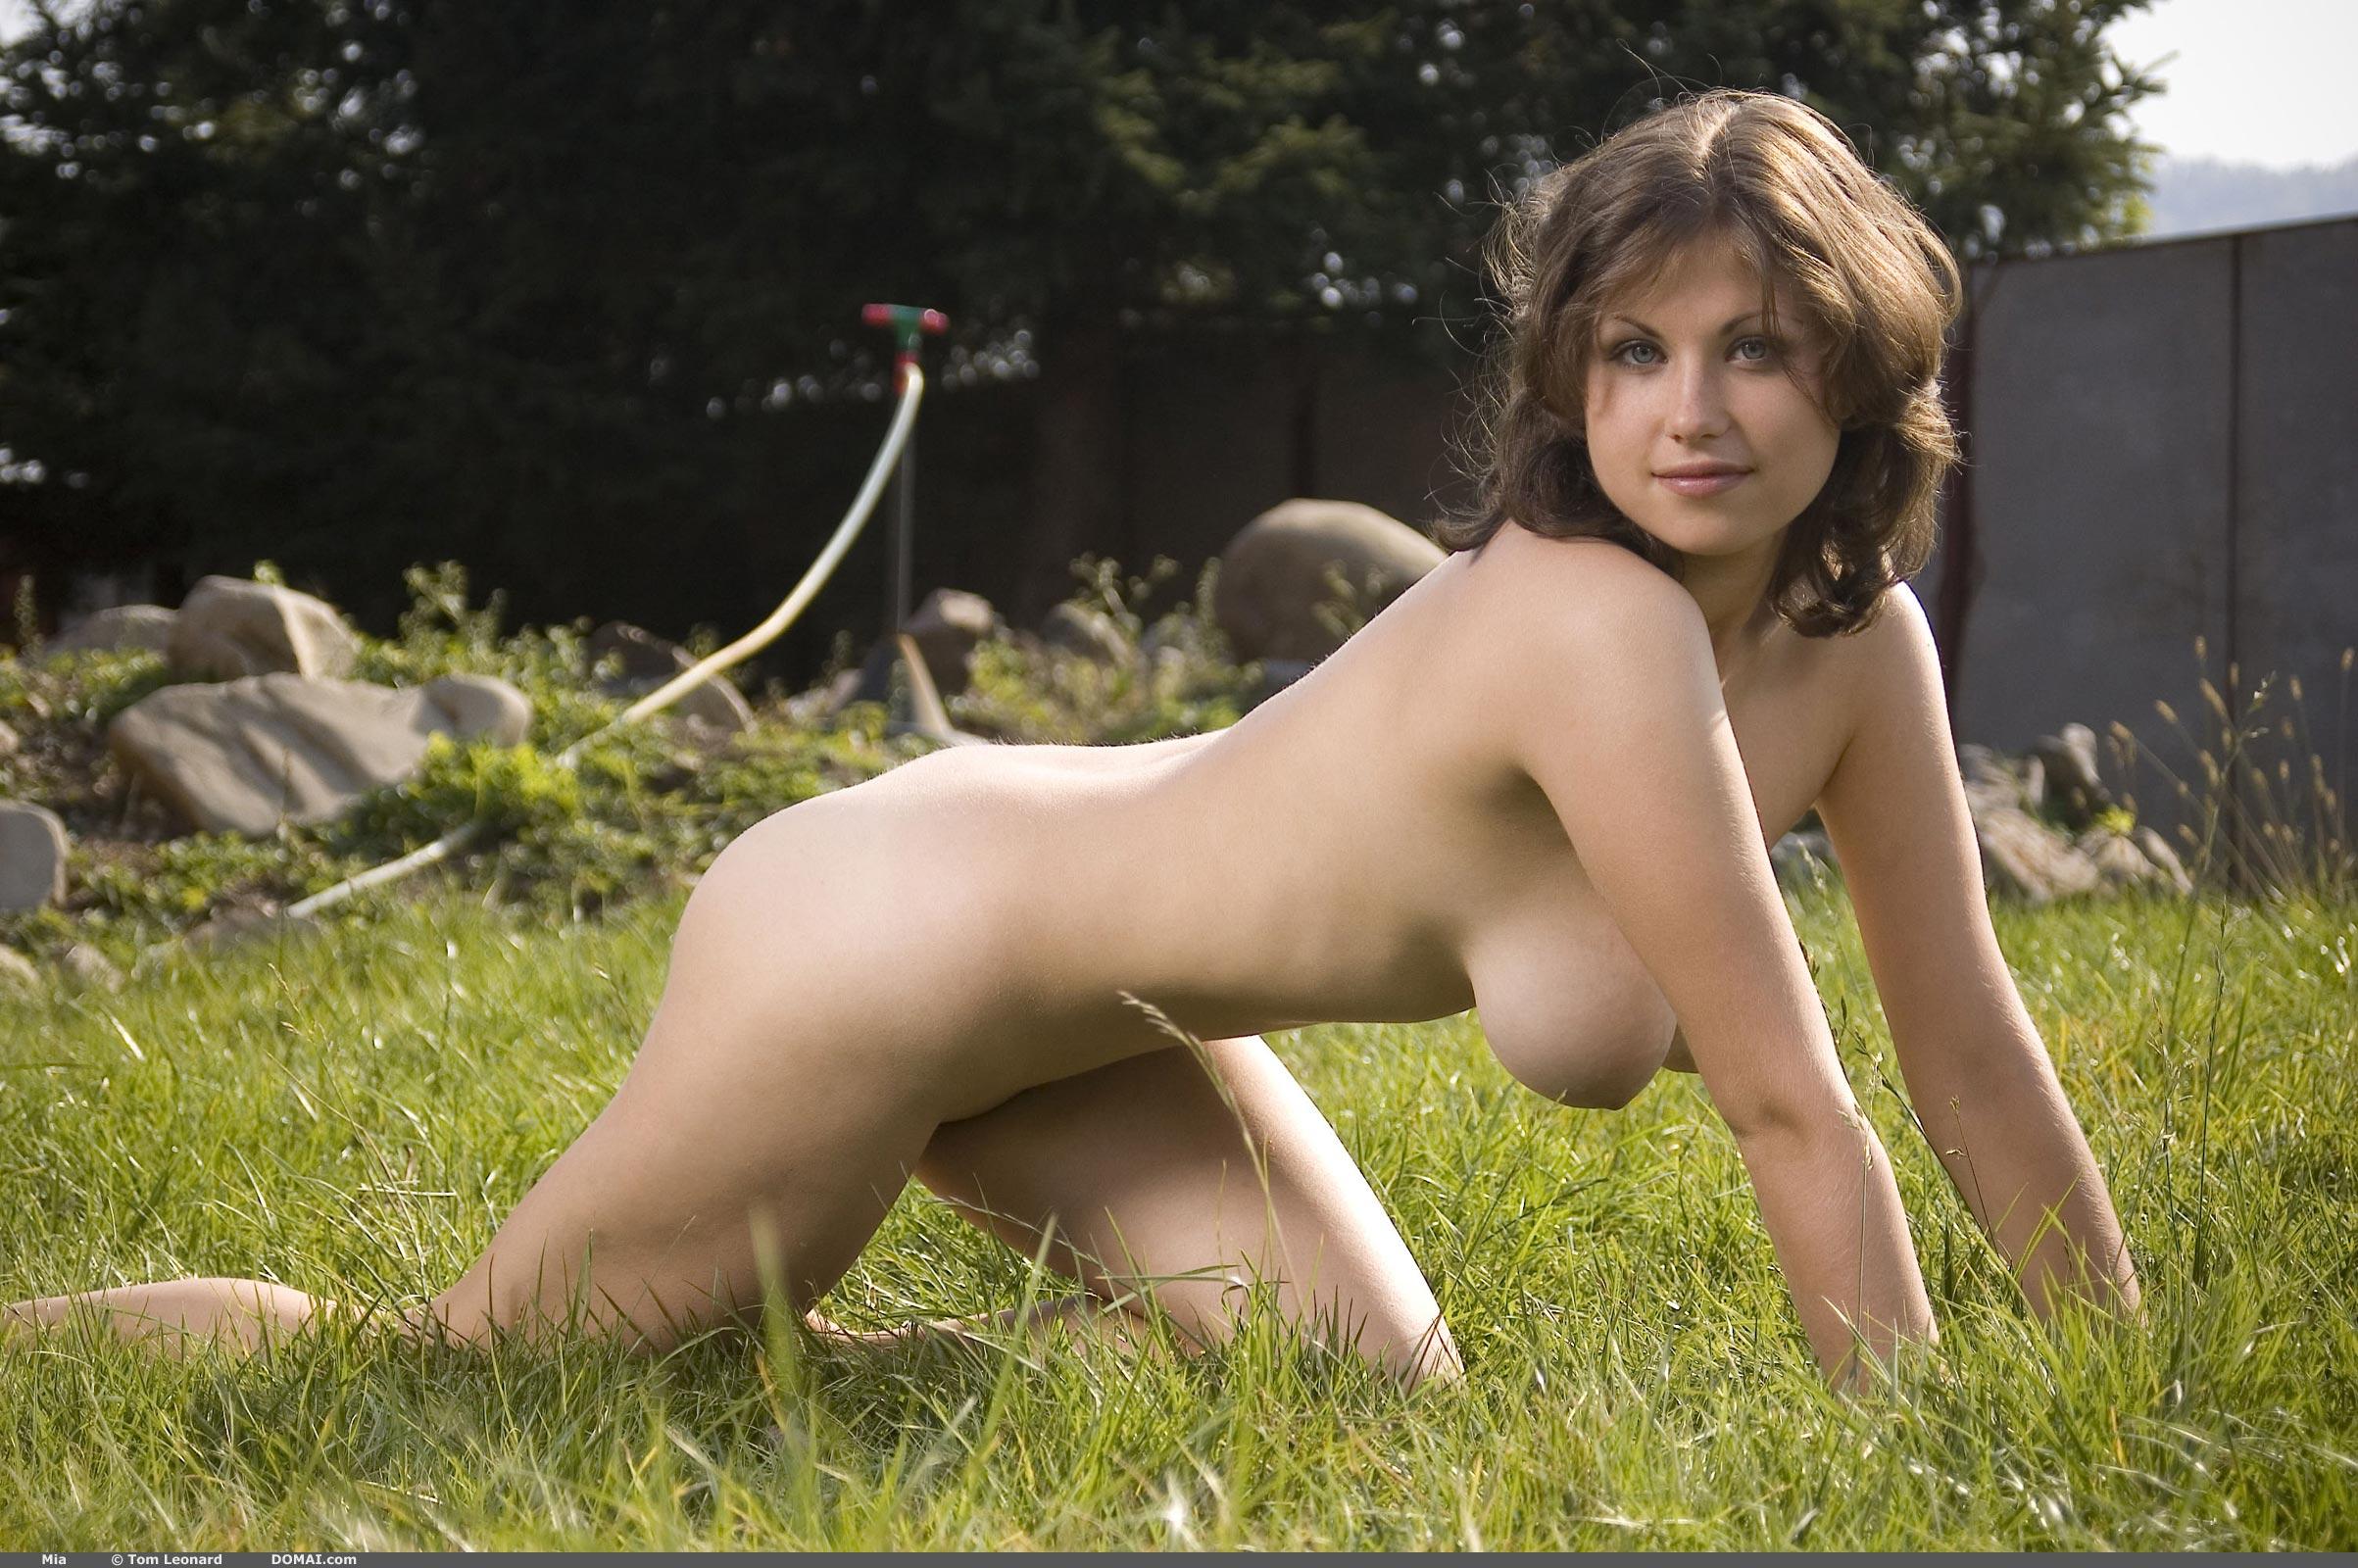 natural nude girls in nature - DATAWAV